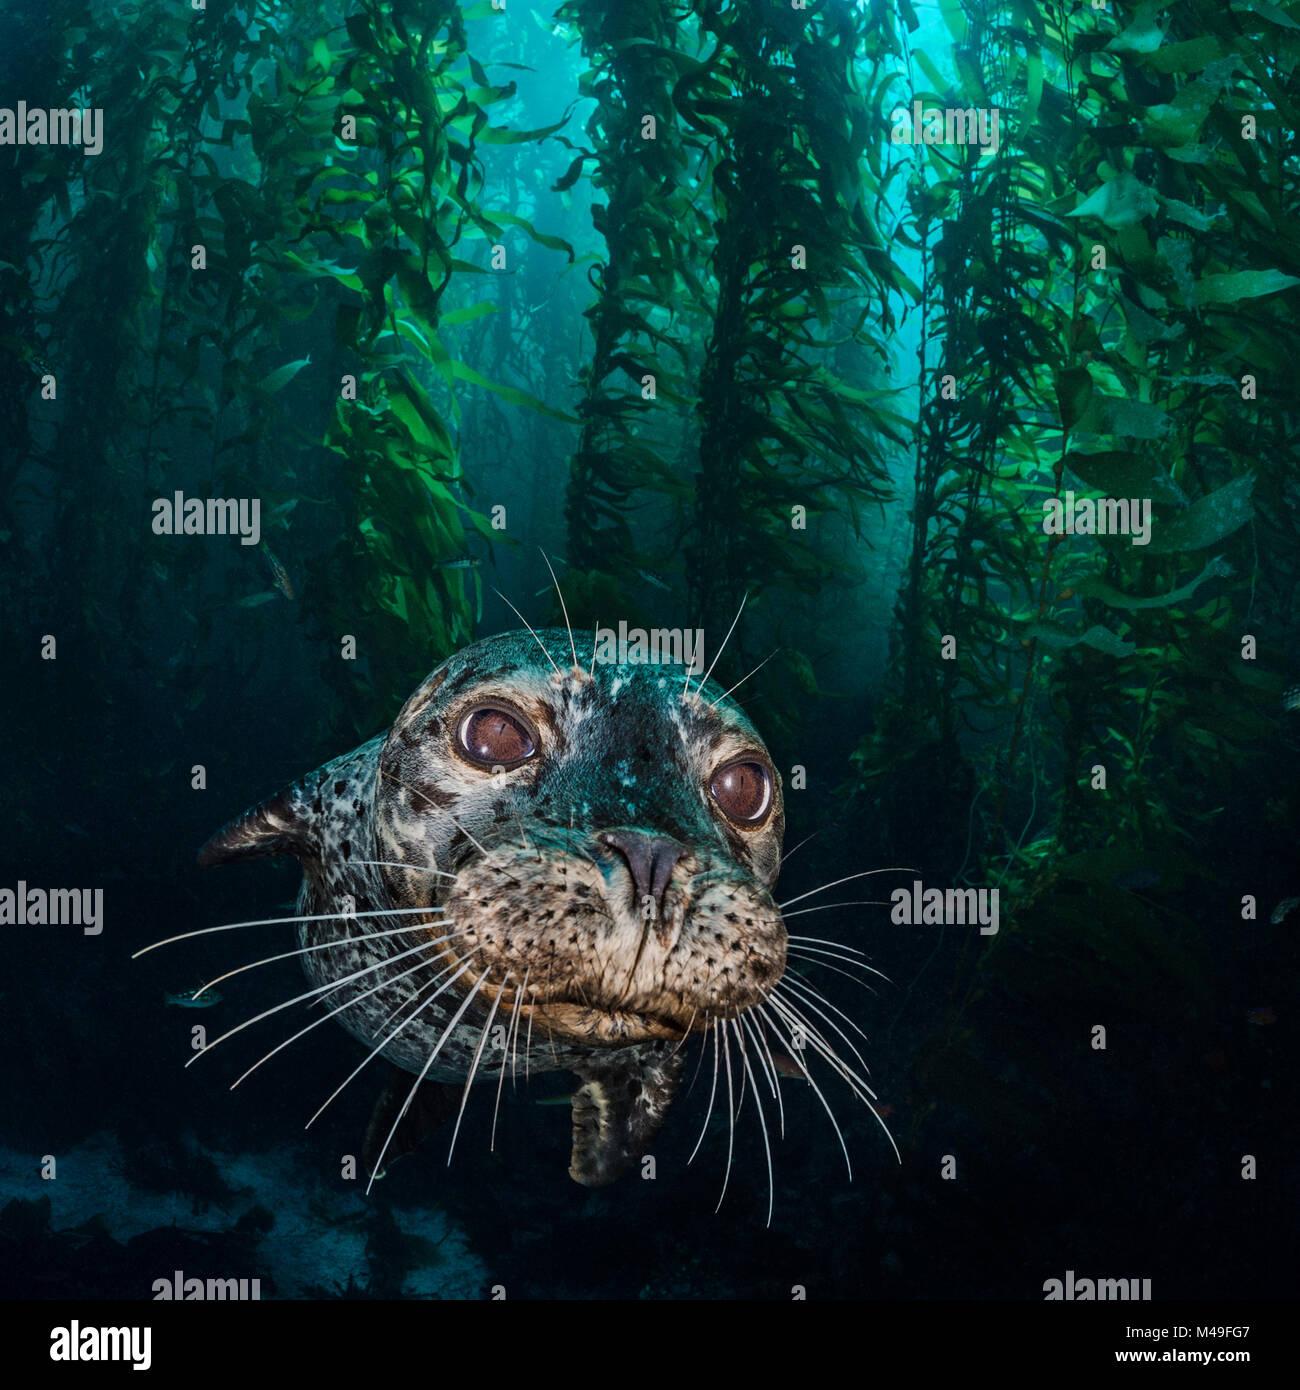 Harbour seal (Phoca vitulina) in the kelp forest (Macrocystis pyrifera). Santa Barbara Island, Channel Islands. - Stock Image